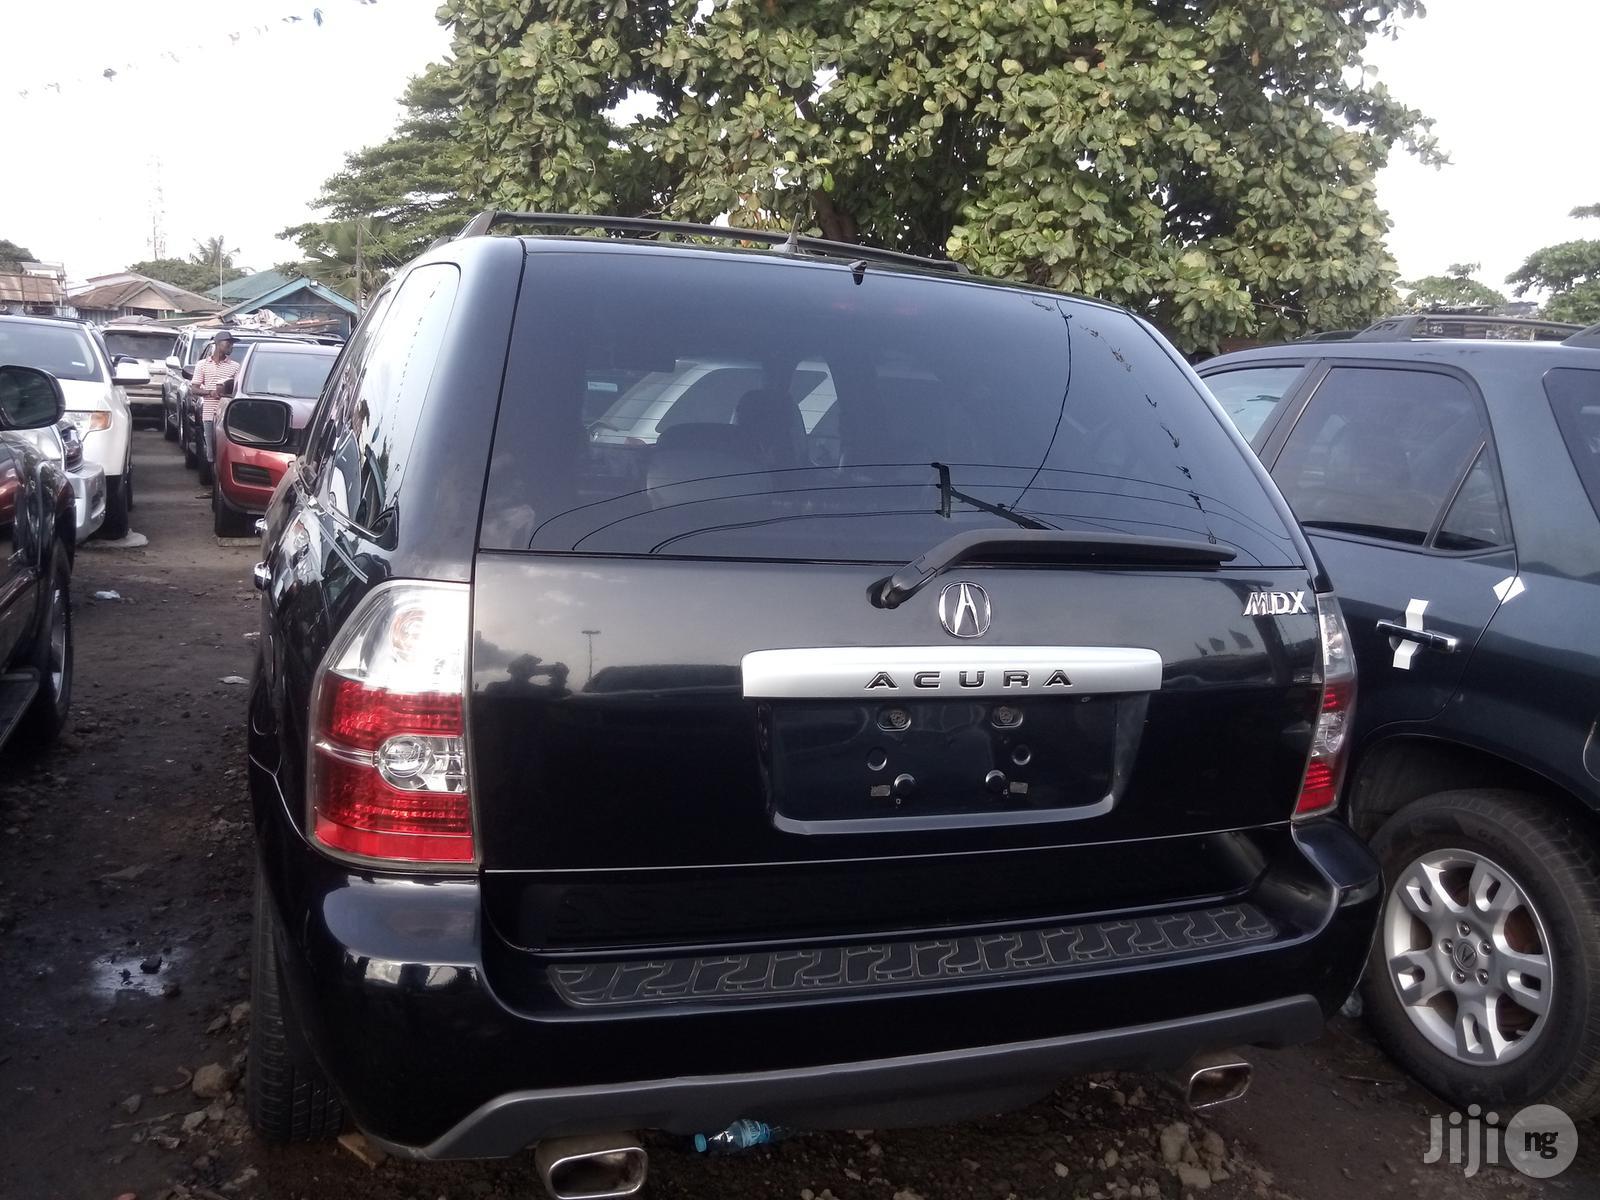 Acura MDX 2005 Black   Cars for sale in Apapa, Lagos State, Nigeria